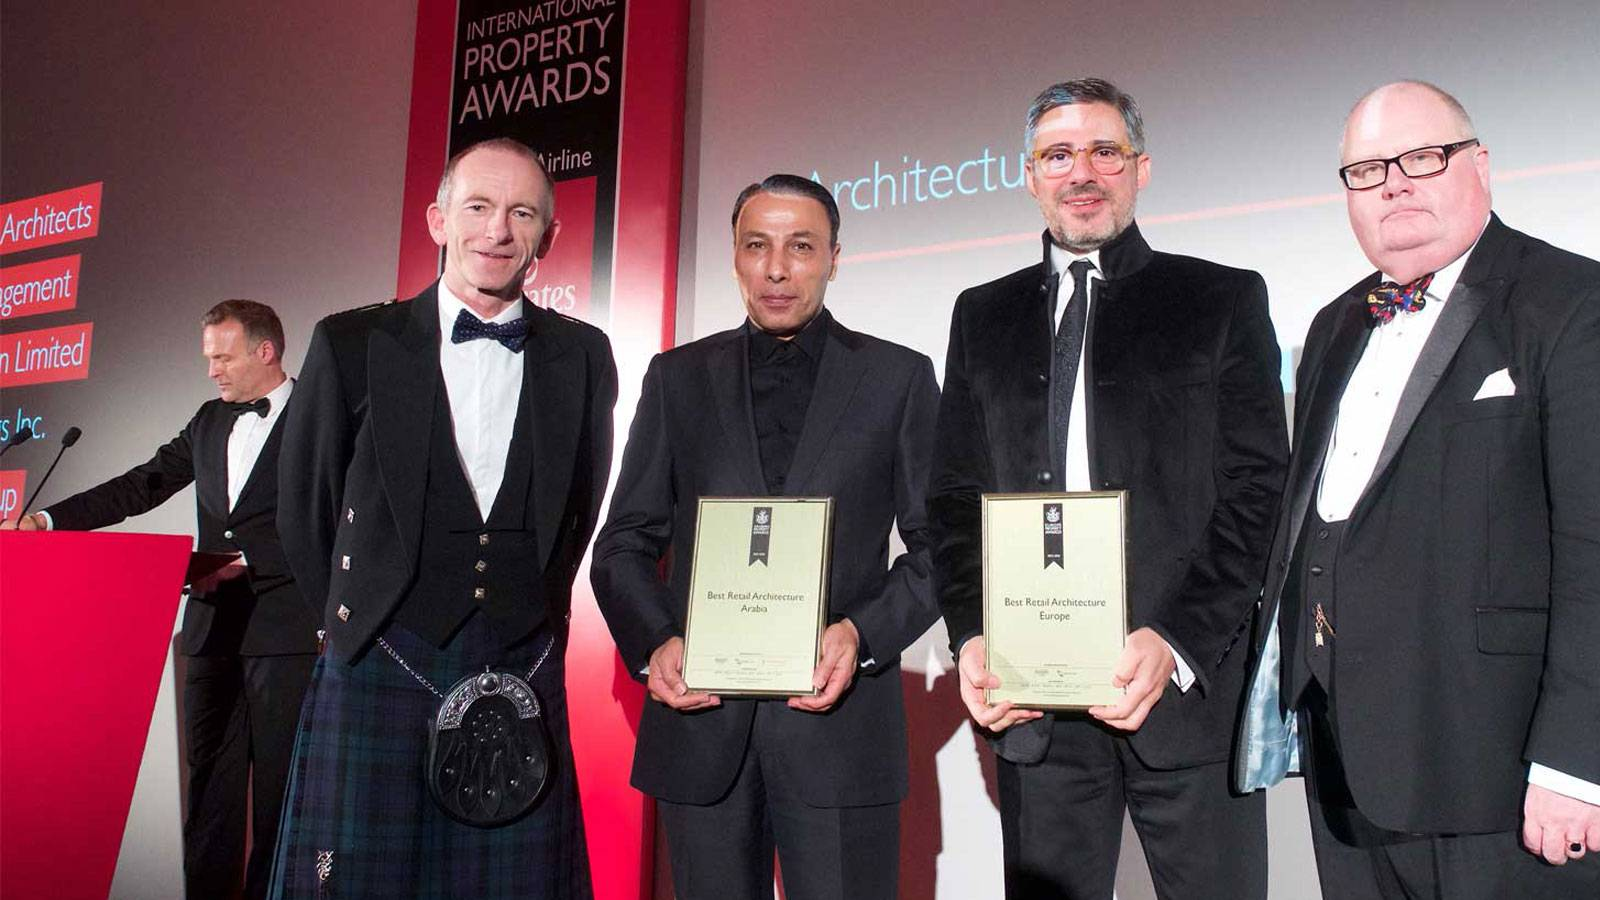 07.12.2015 International Property Awards Gala